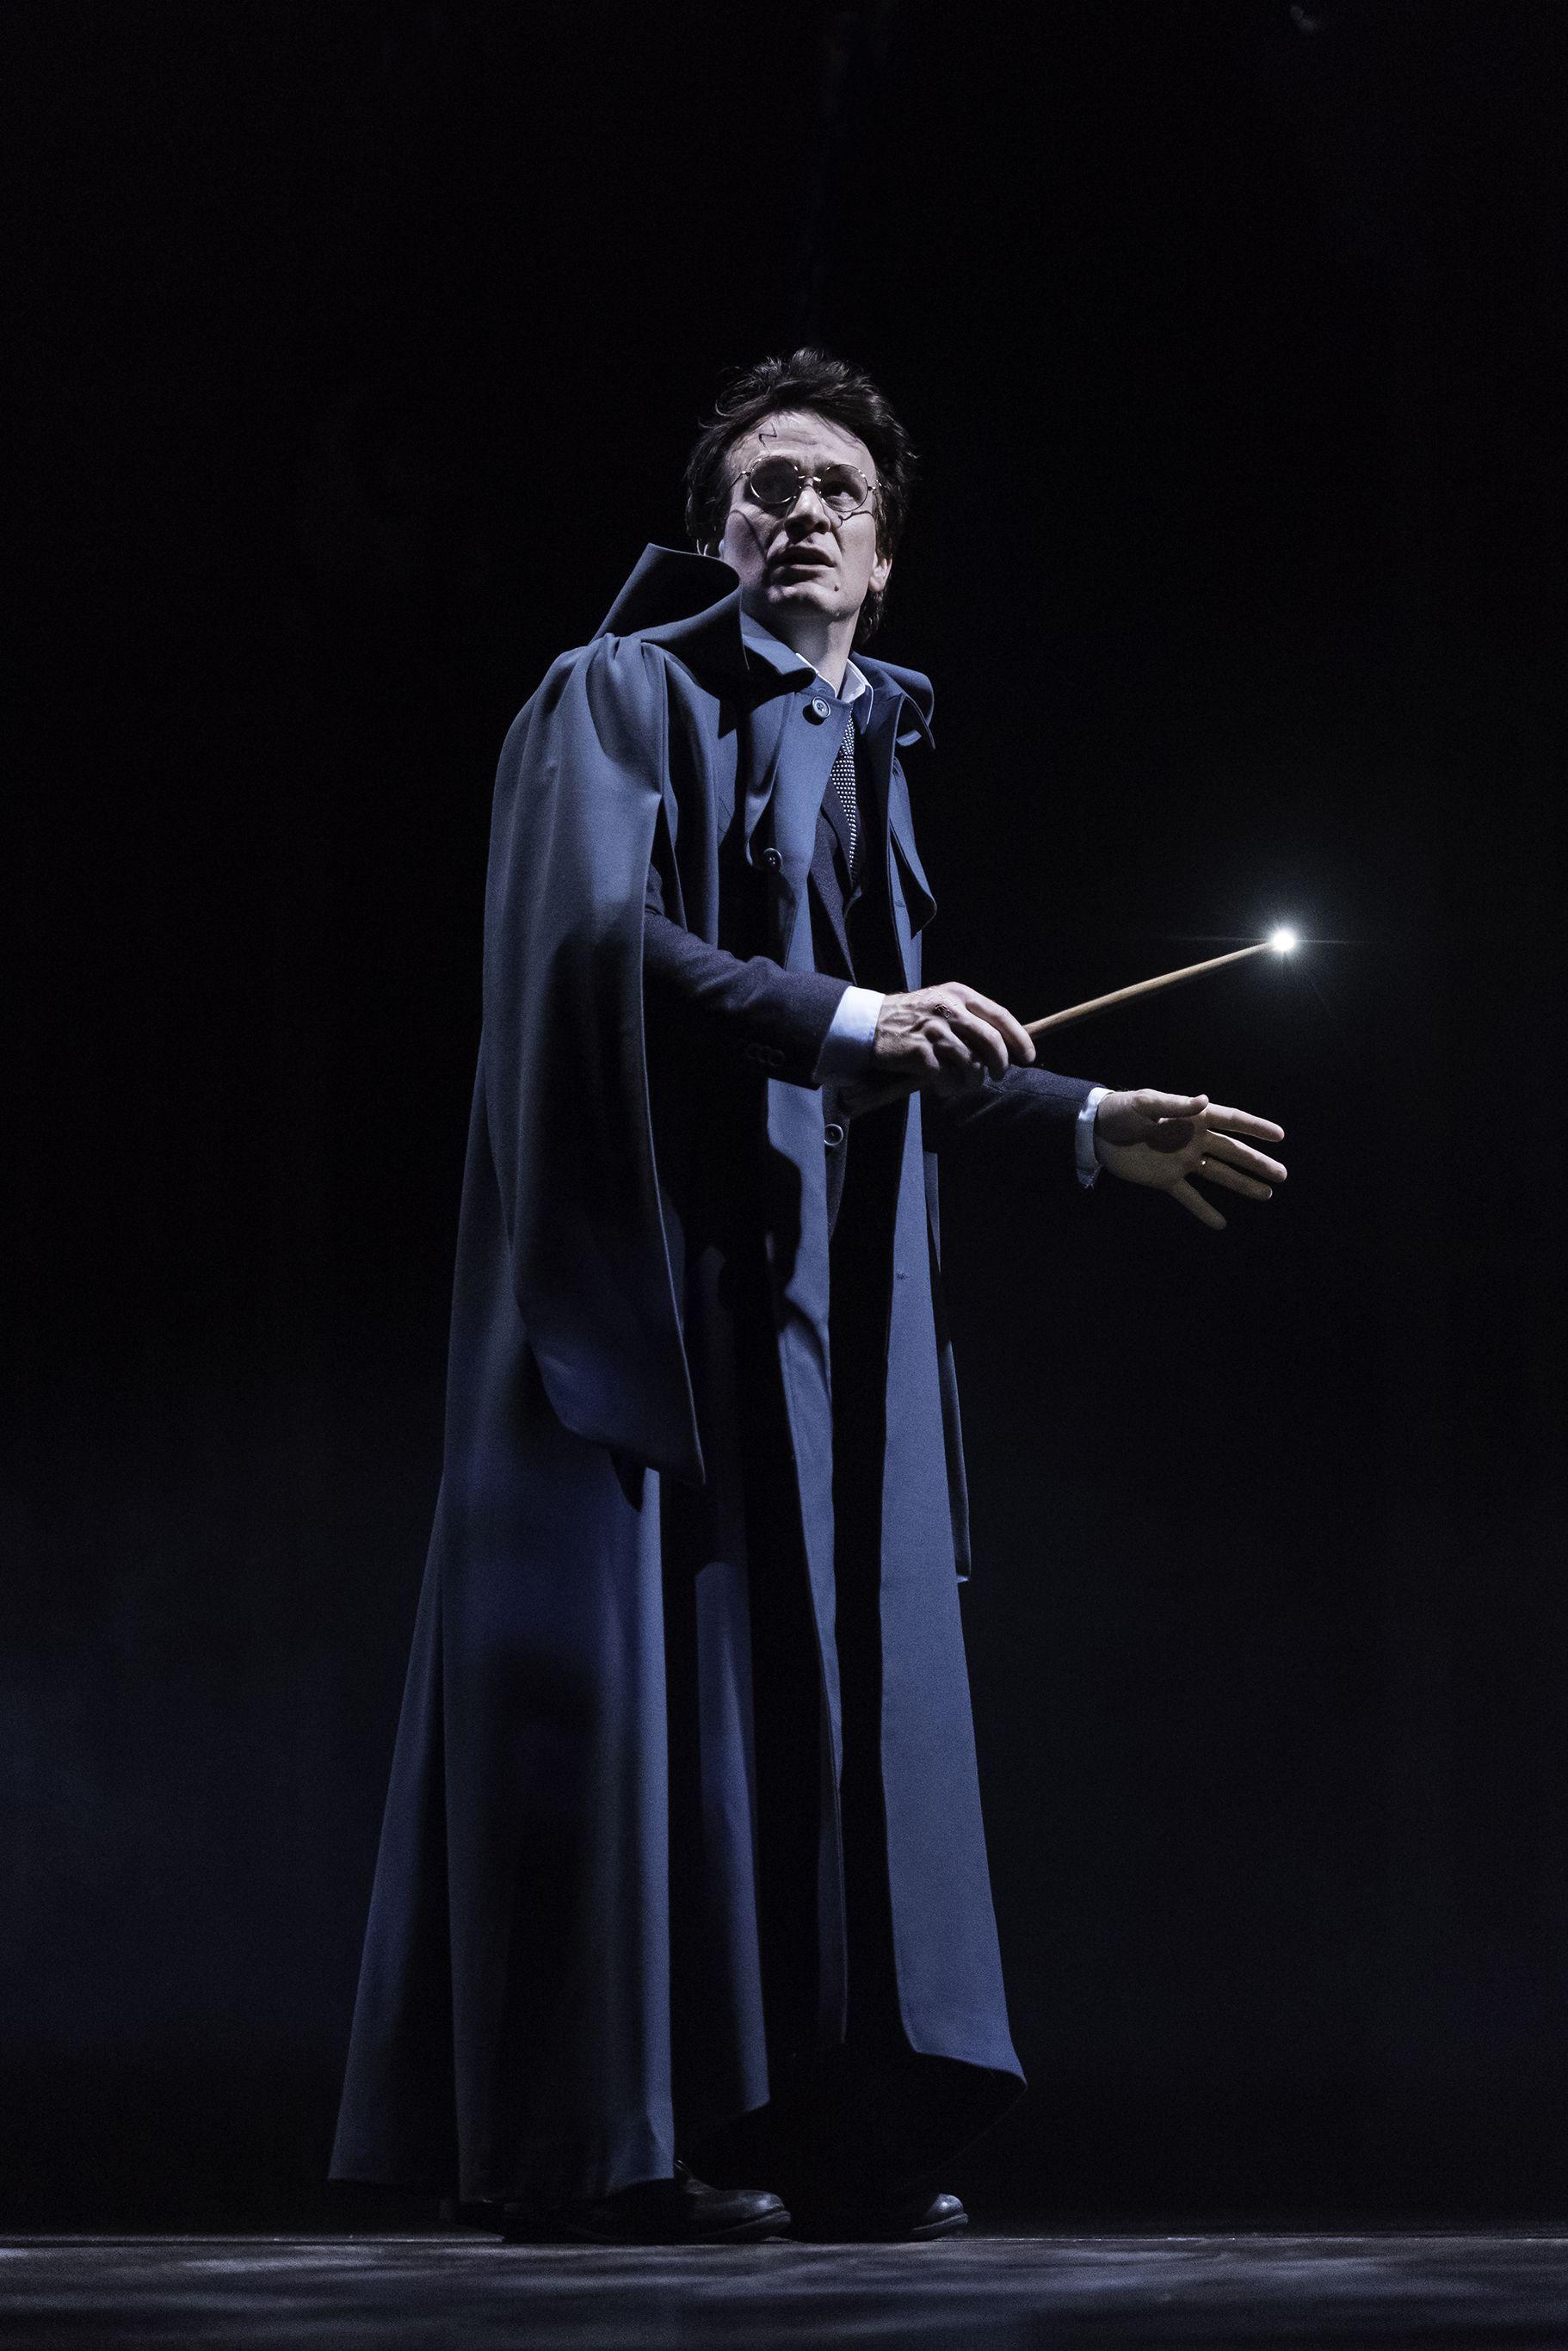 Harry Potter Theater Harry Potter Und Das Verwunschene Kind Das Verwunschene Kind Harry James Potter Theaterstuck